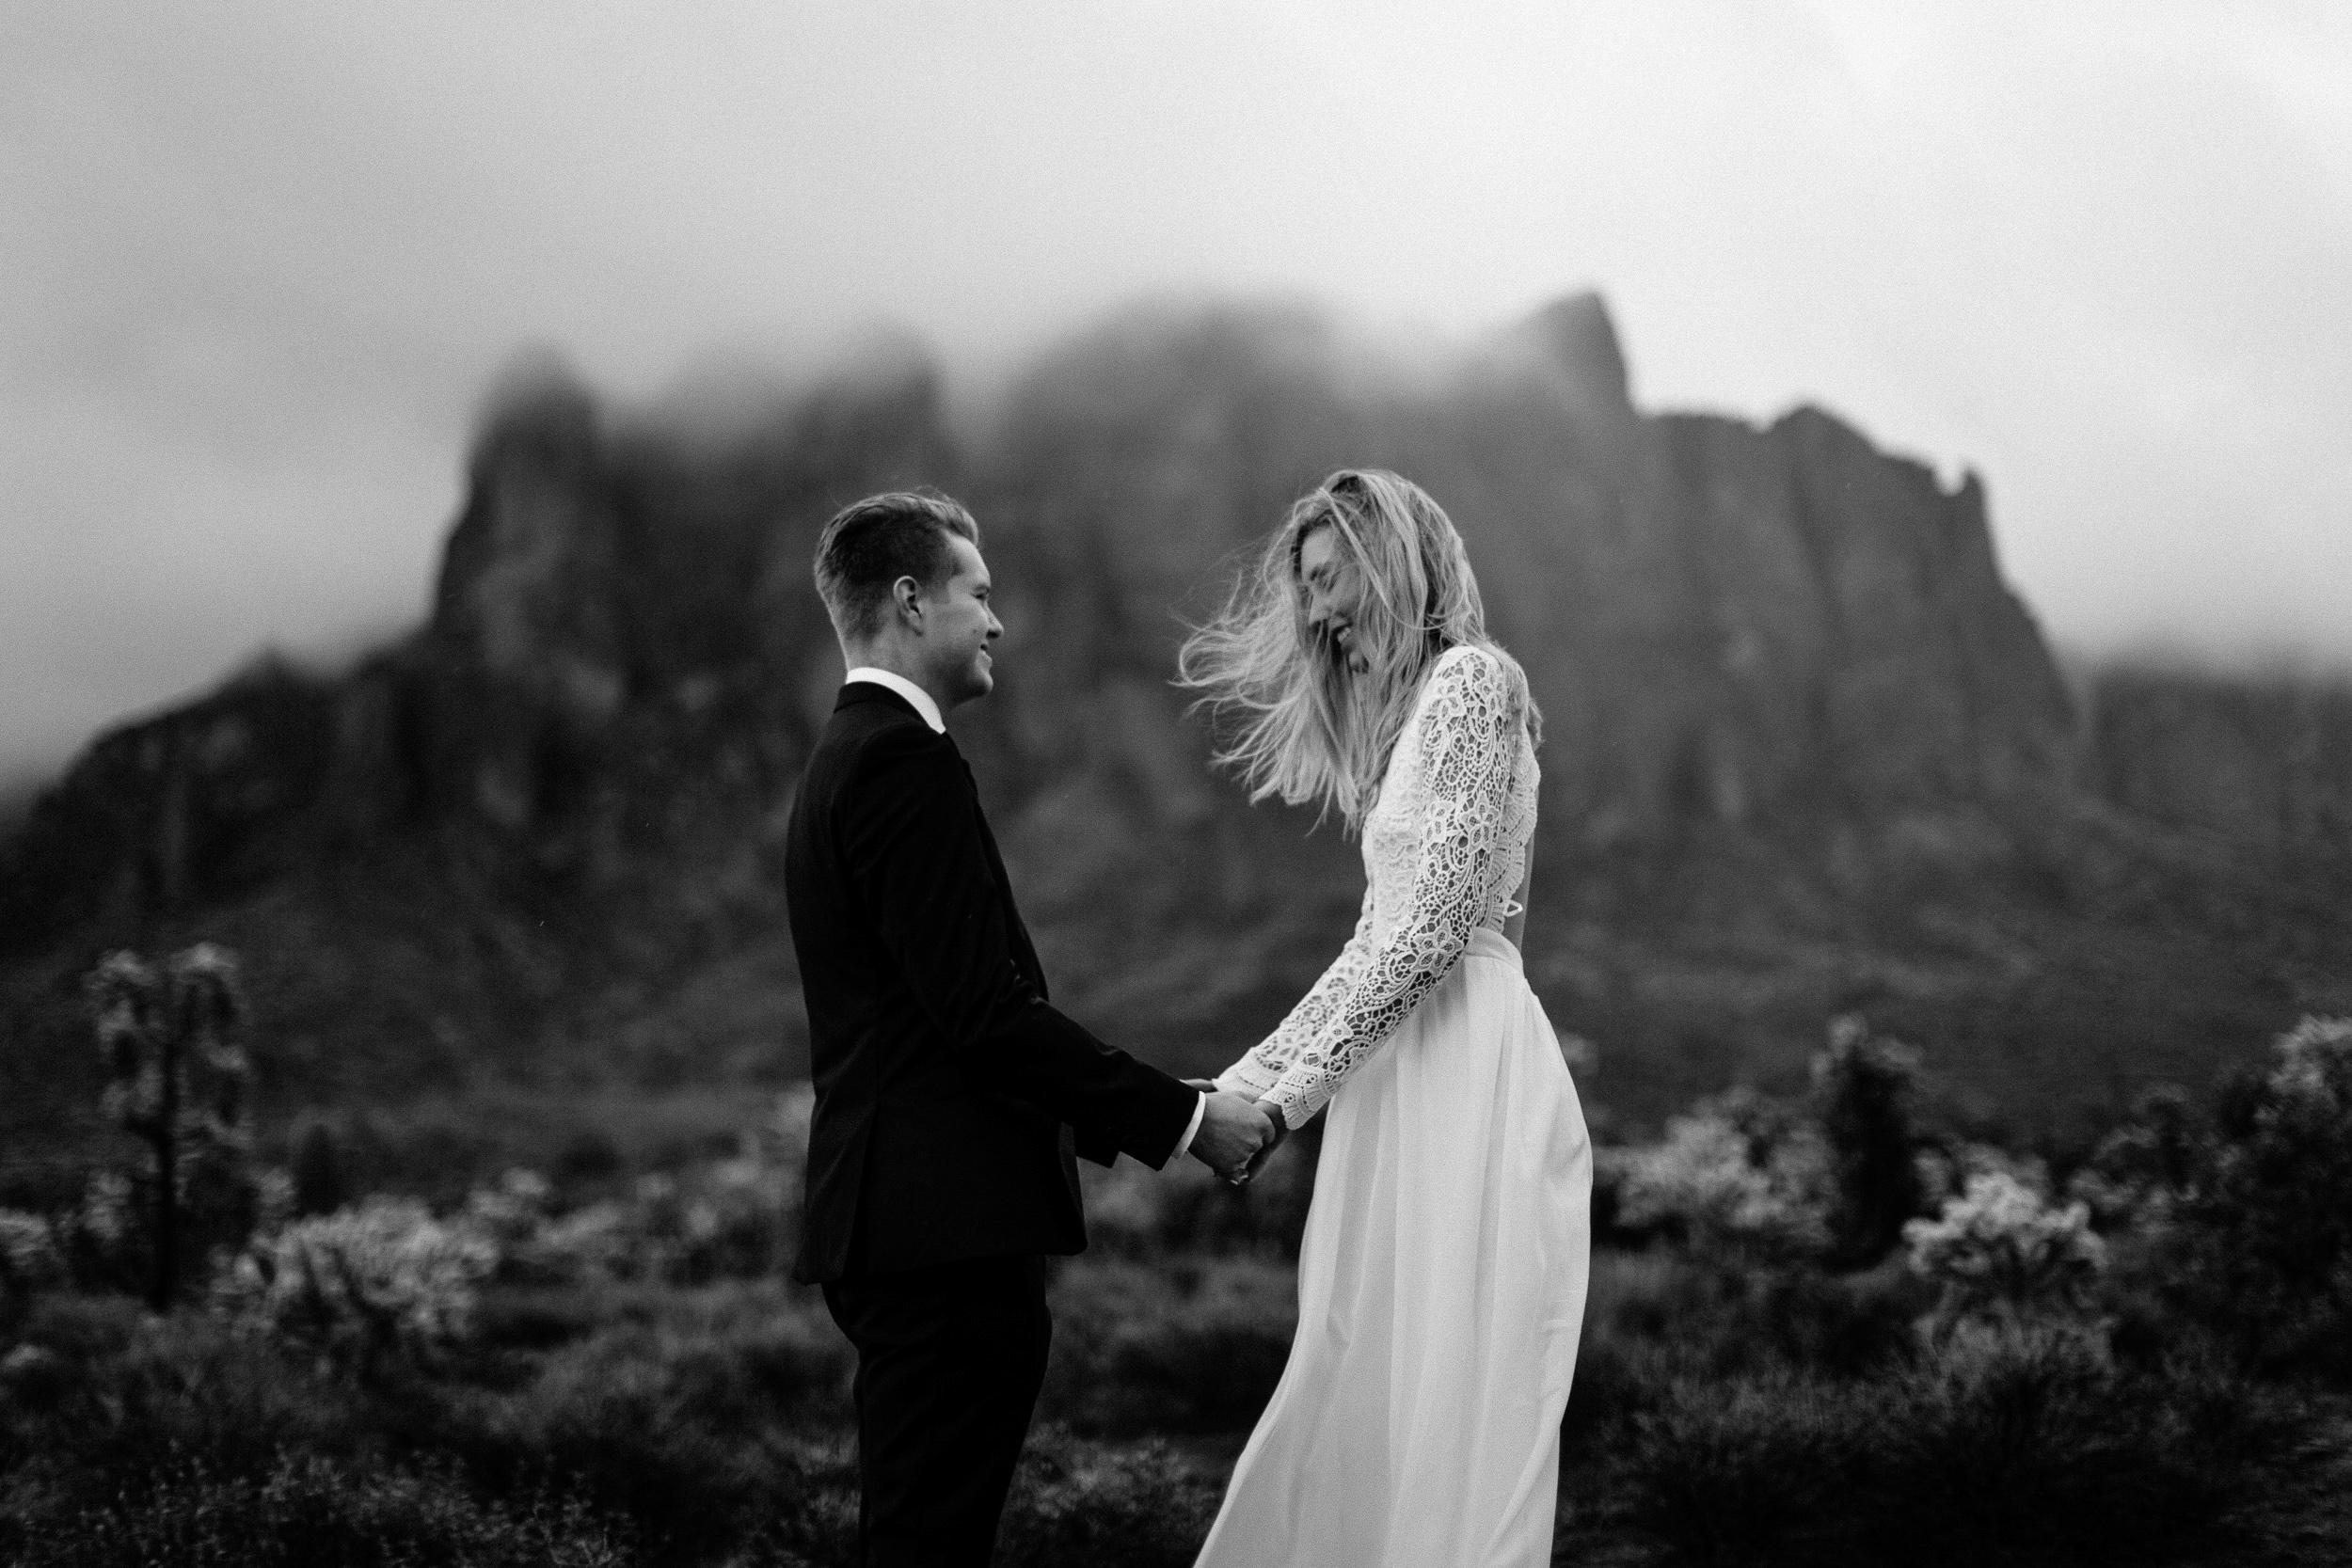 phoenix-mesa-elopement-wedding-photographer-lost-dutchman-state-park-superstitious-mountains-27.jpg